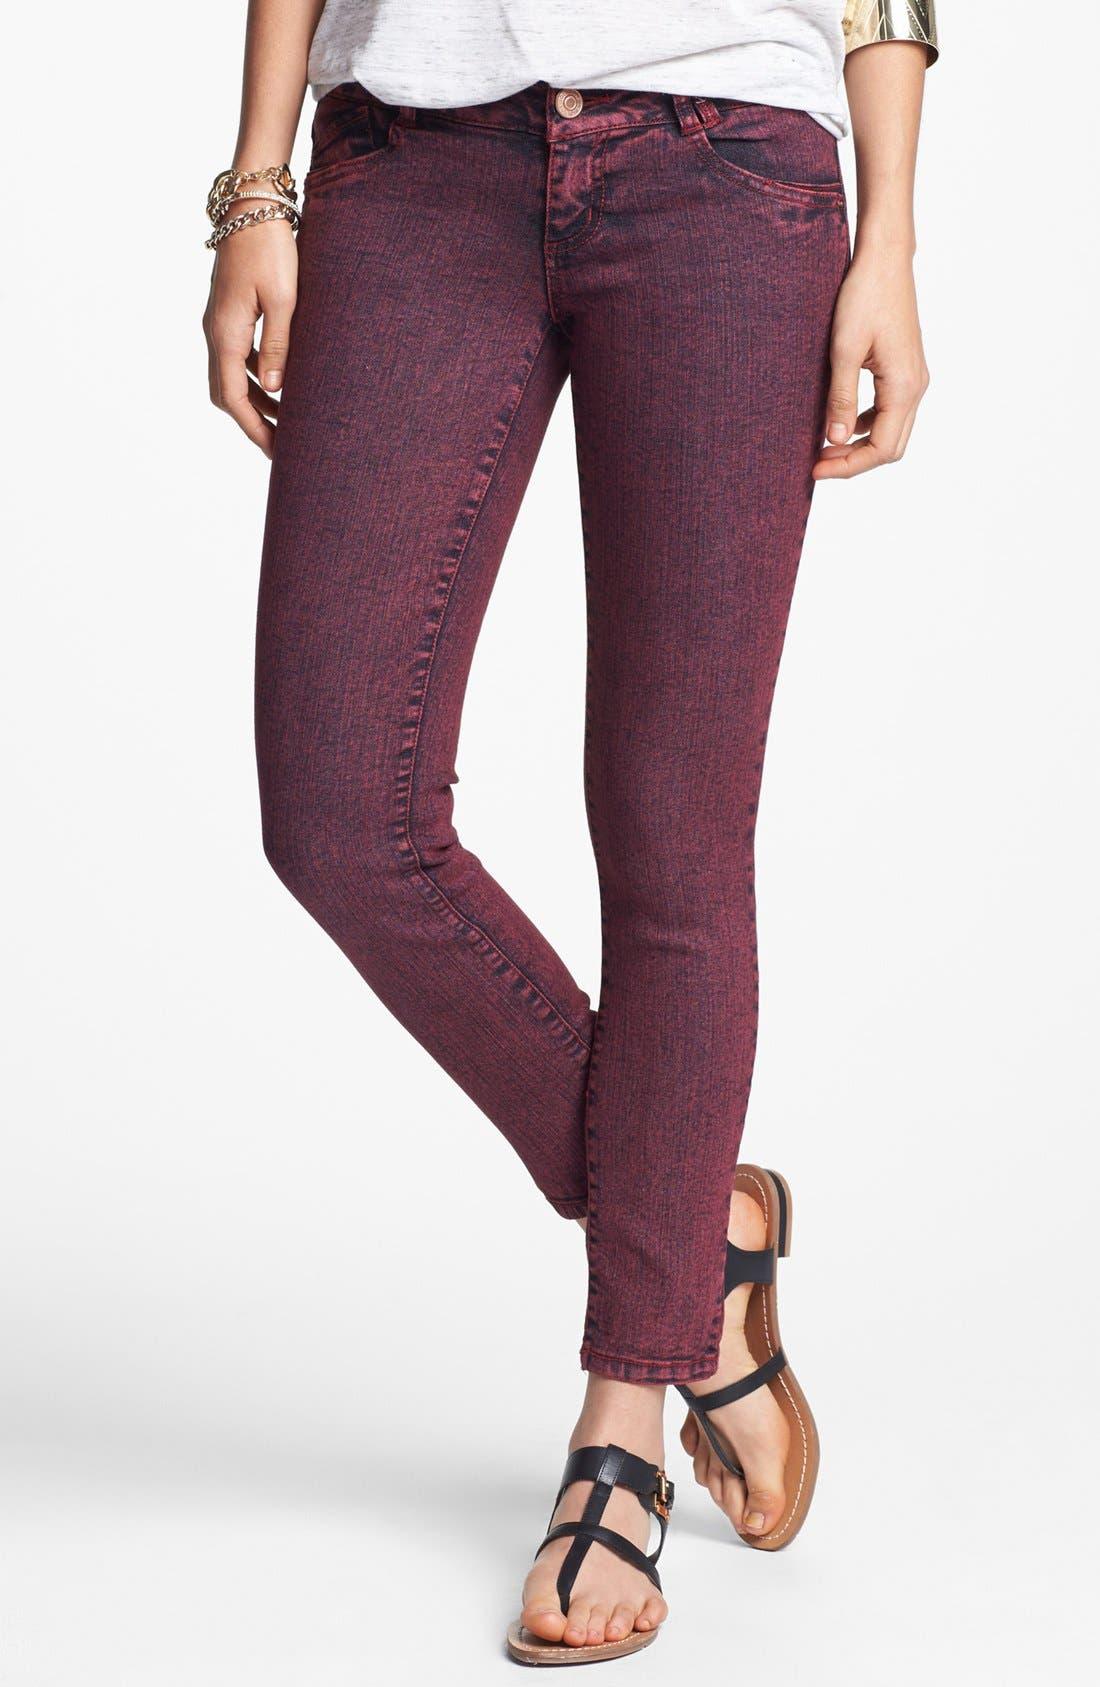 Main Image - Jolt Overdyed Skinny Jeans (Brick) (Juniors)